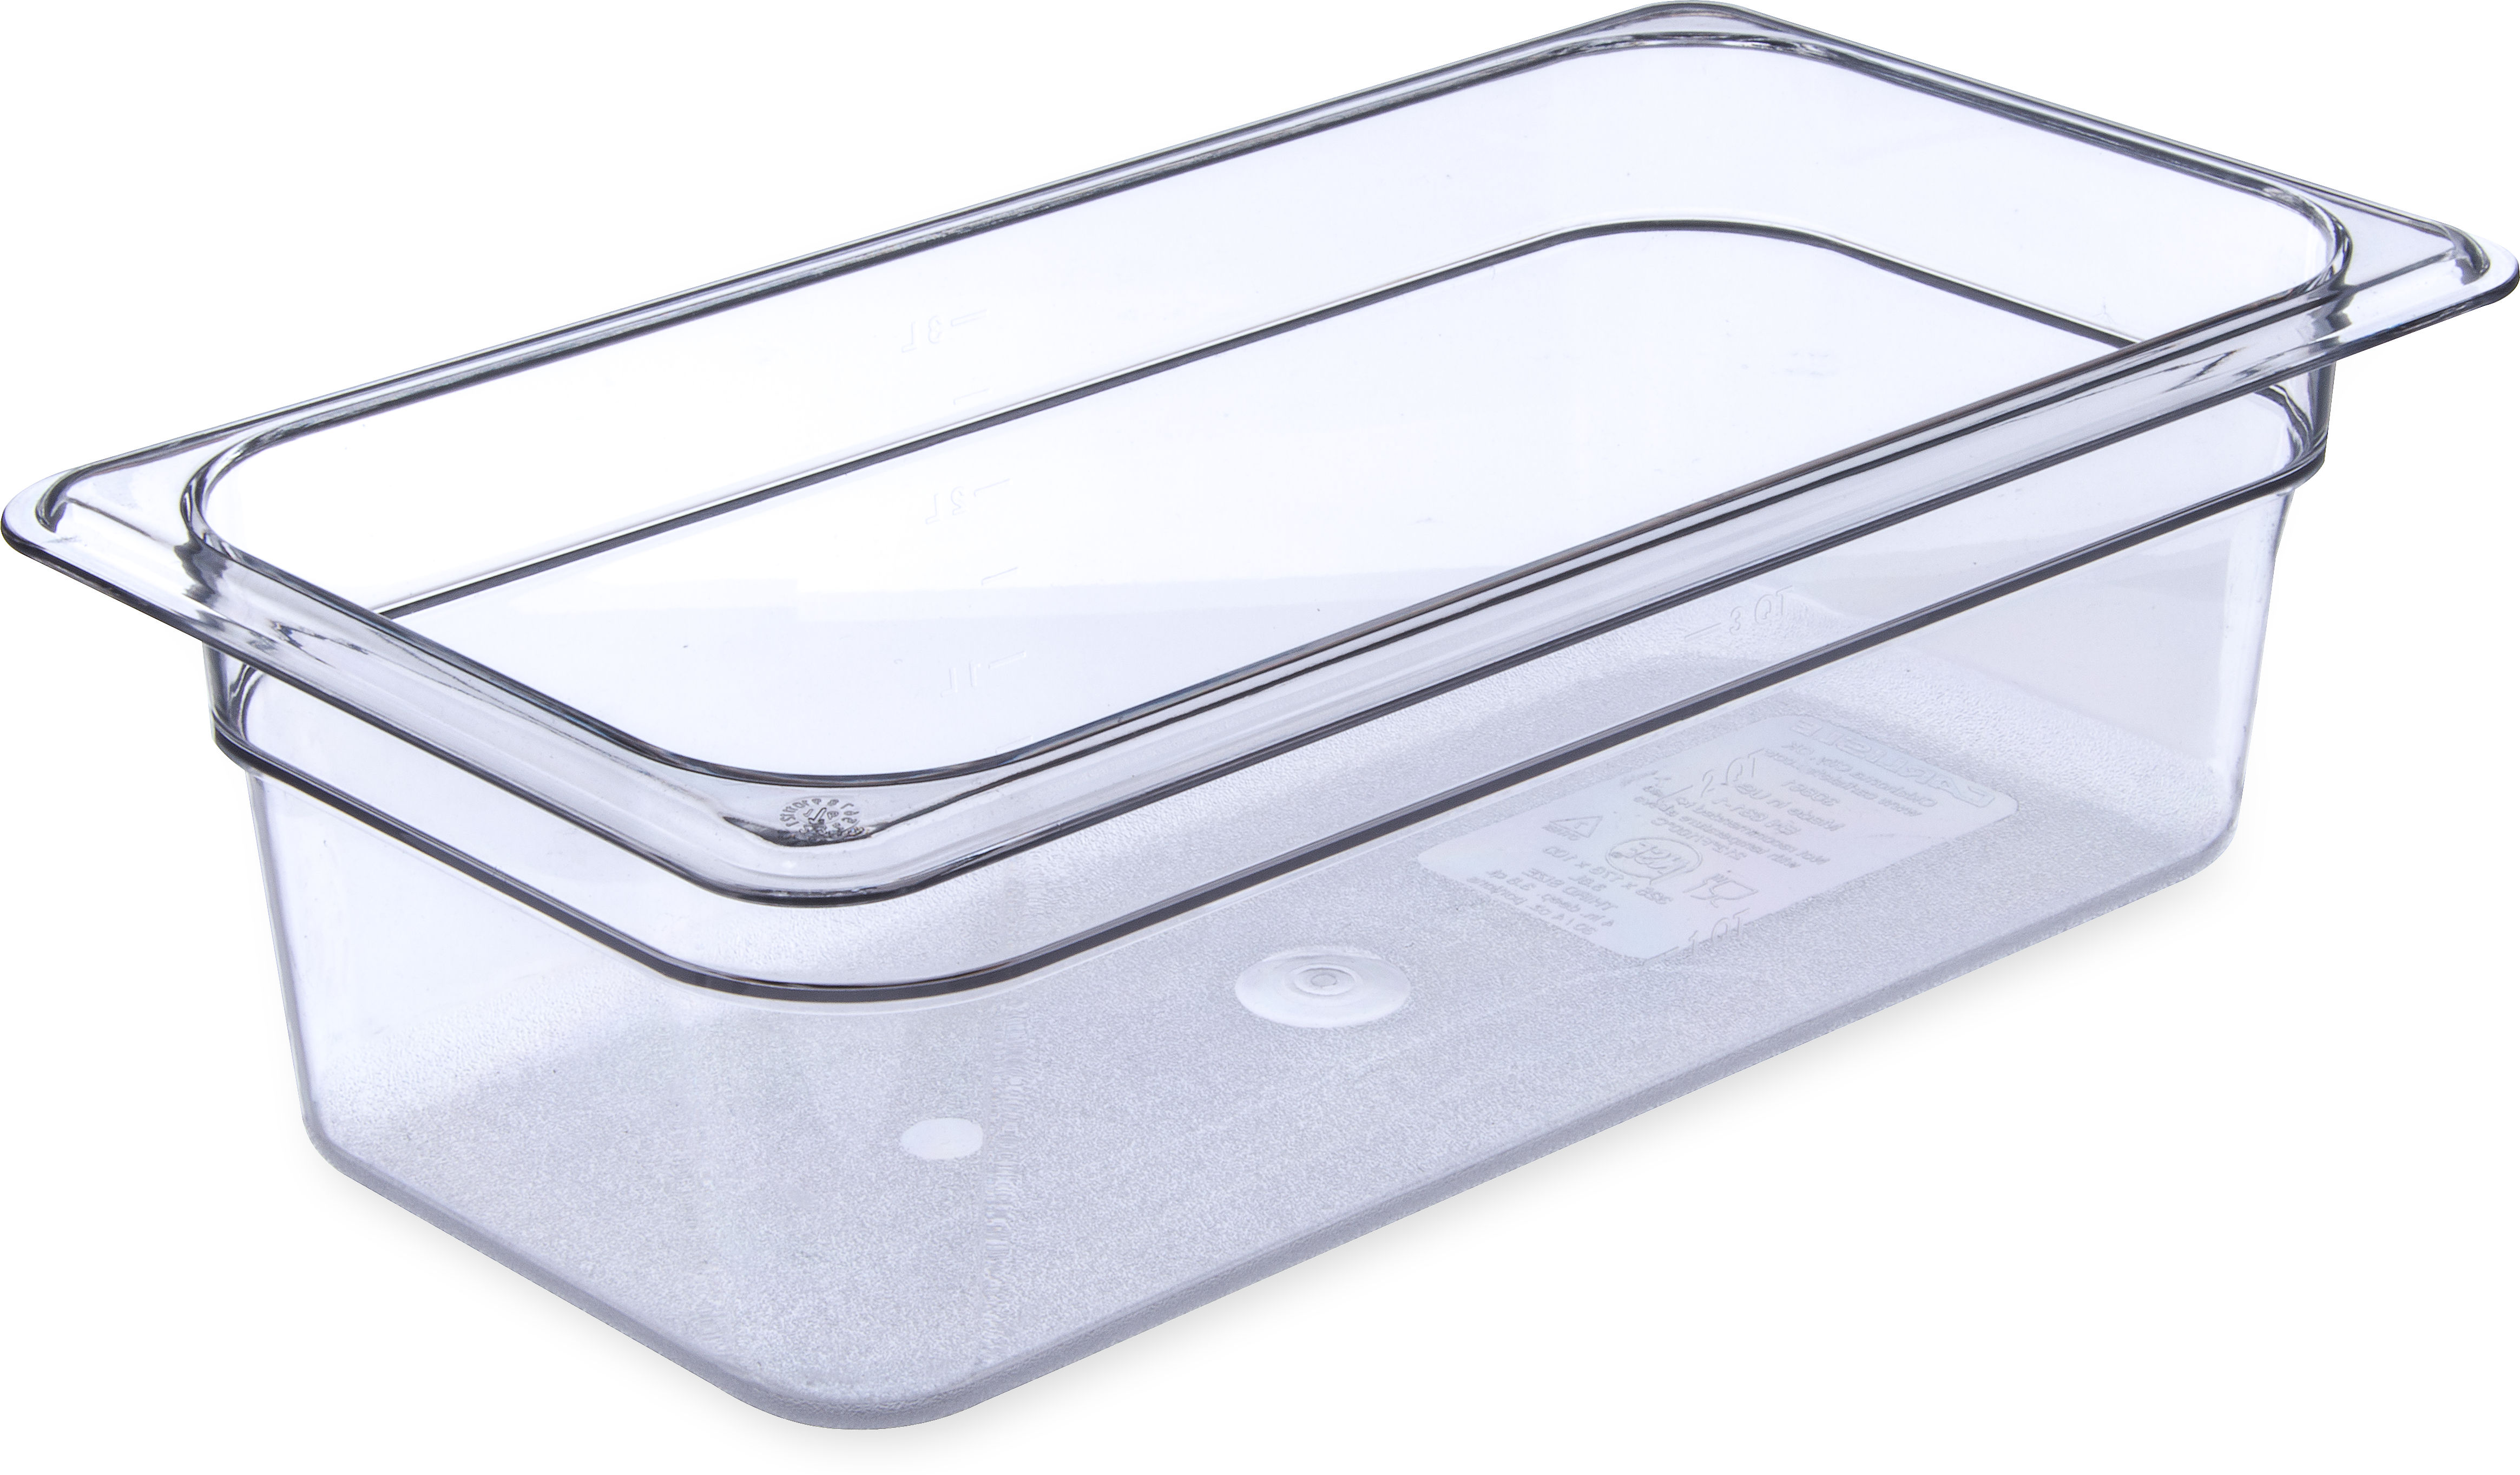 StorPlus Food Pan PC 4 DP 1/3 Size - Clear